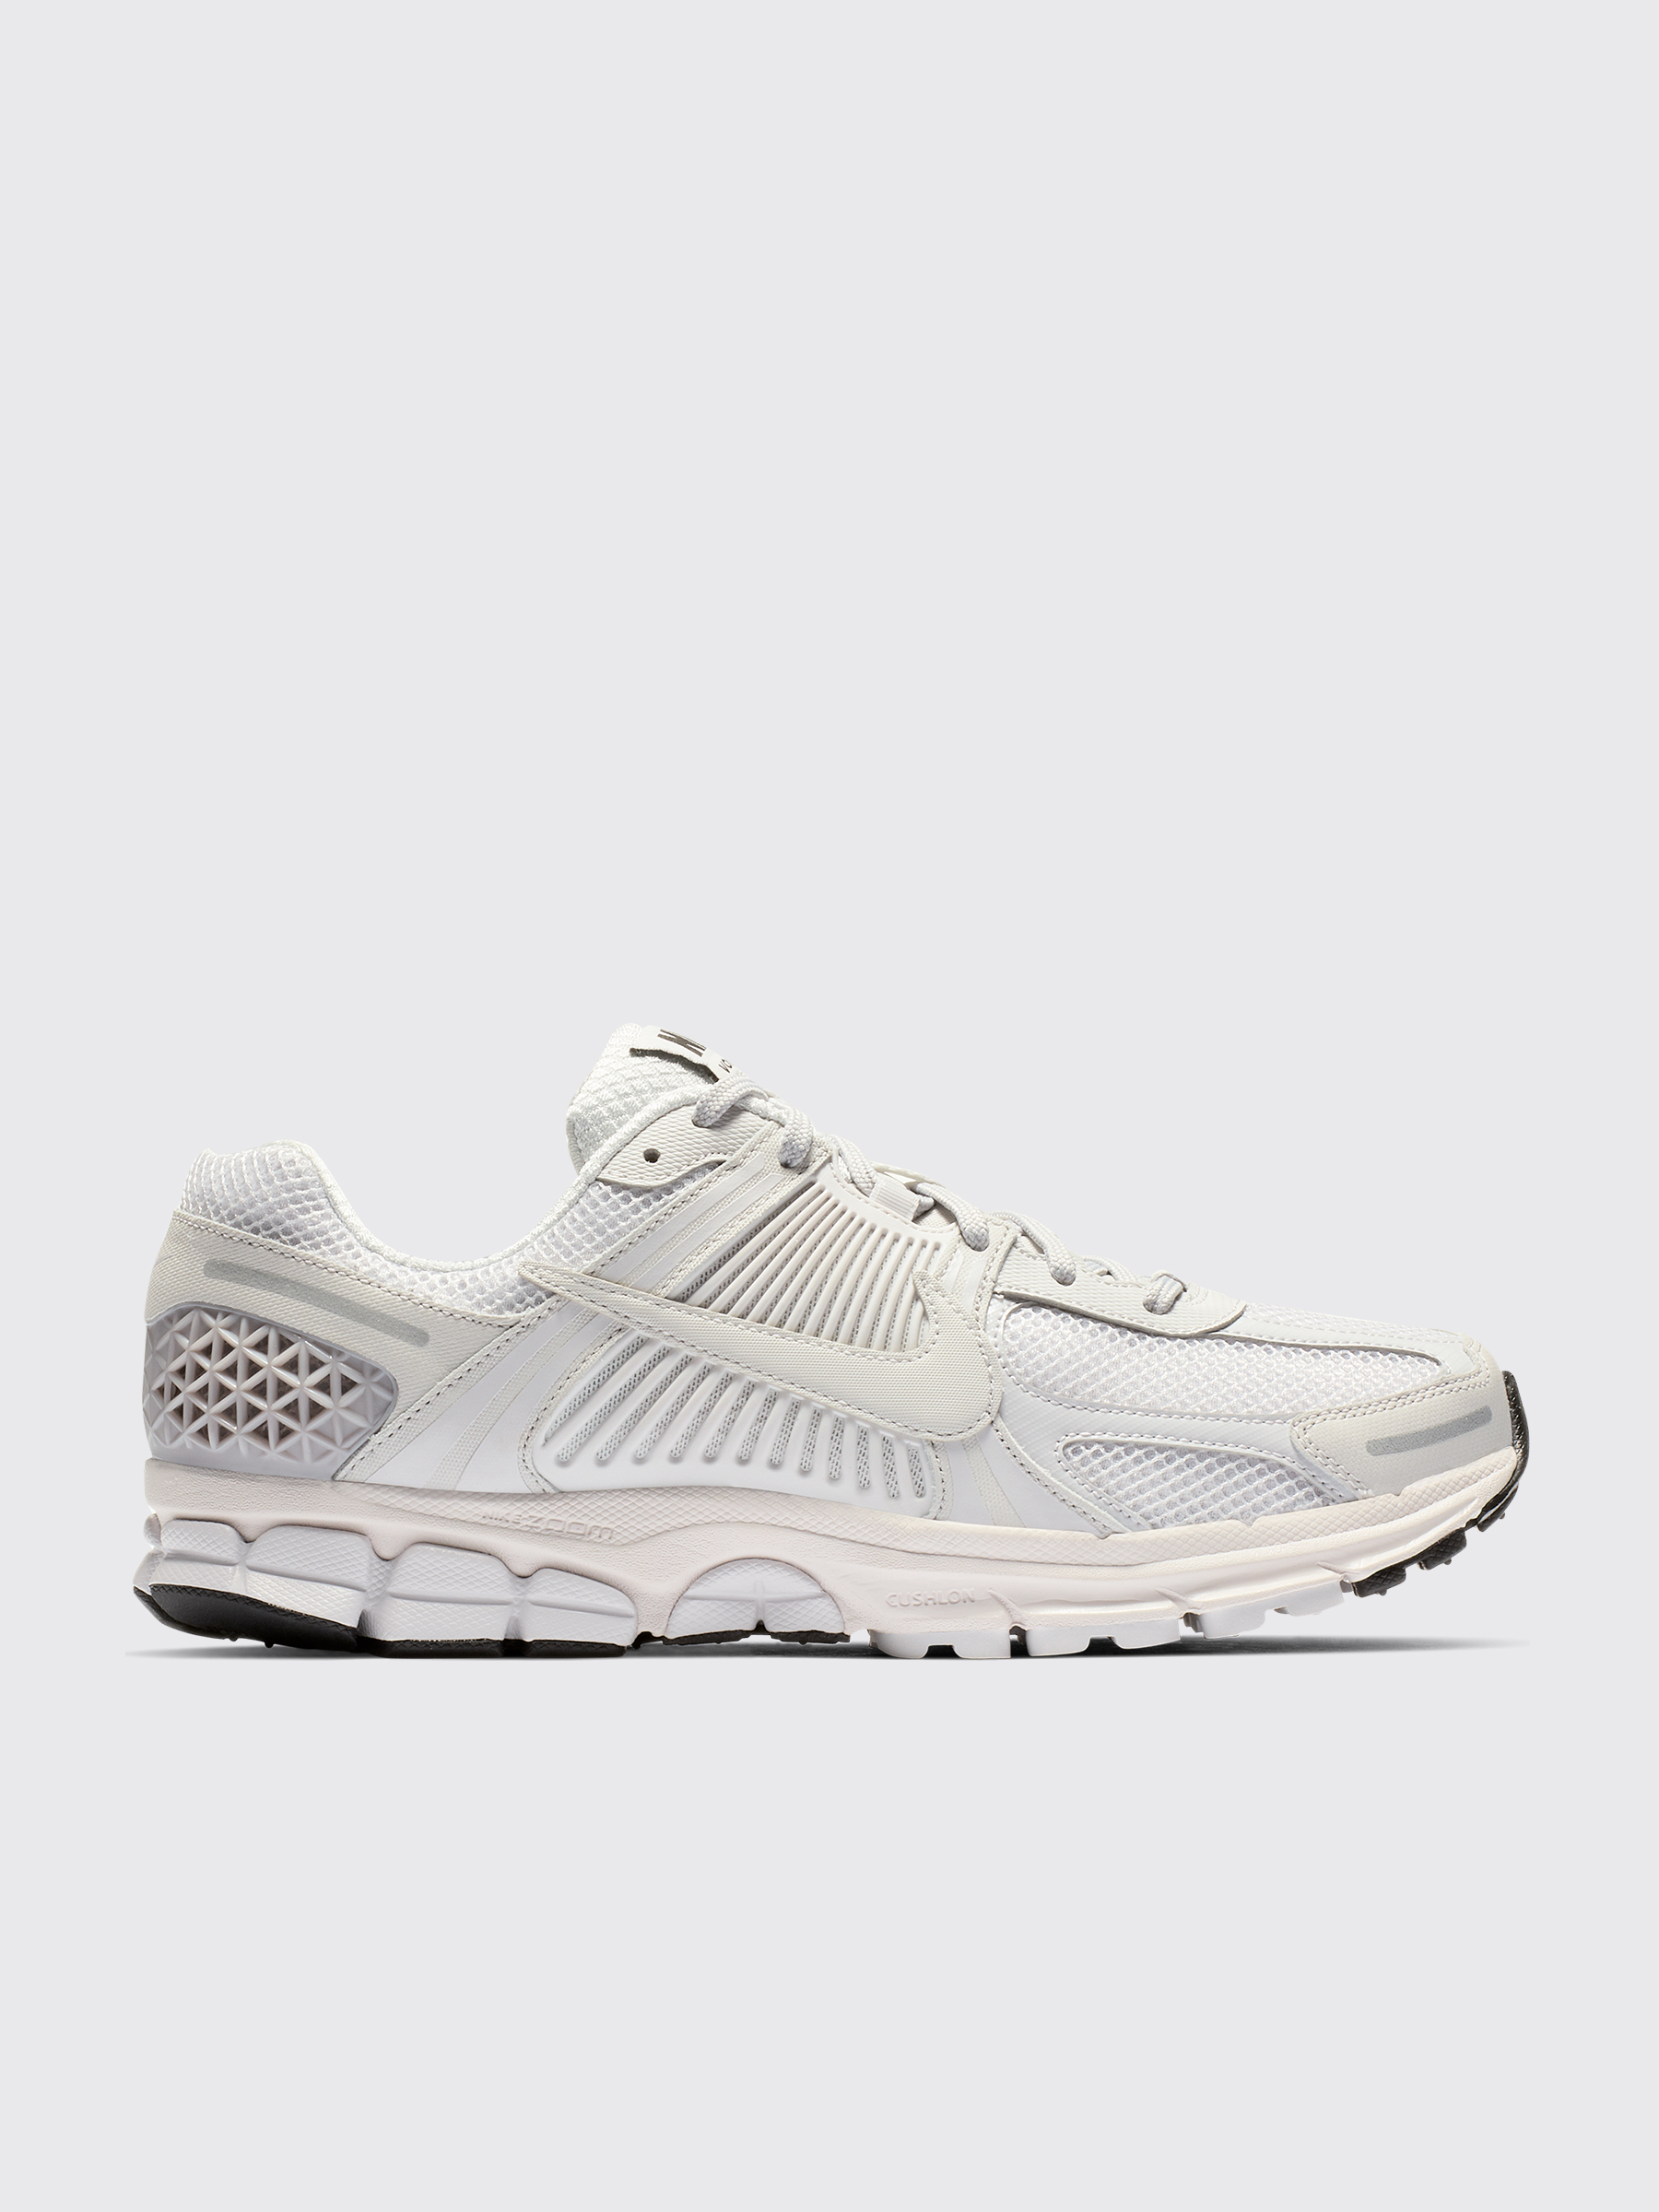 62b92c8bfe1 Très Bien - Nike Zoom Vomero 5 SP Vast Grey   White